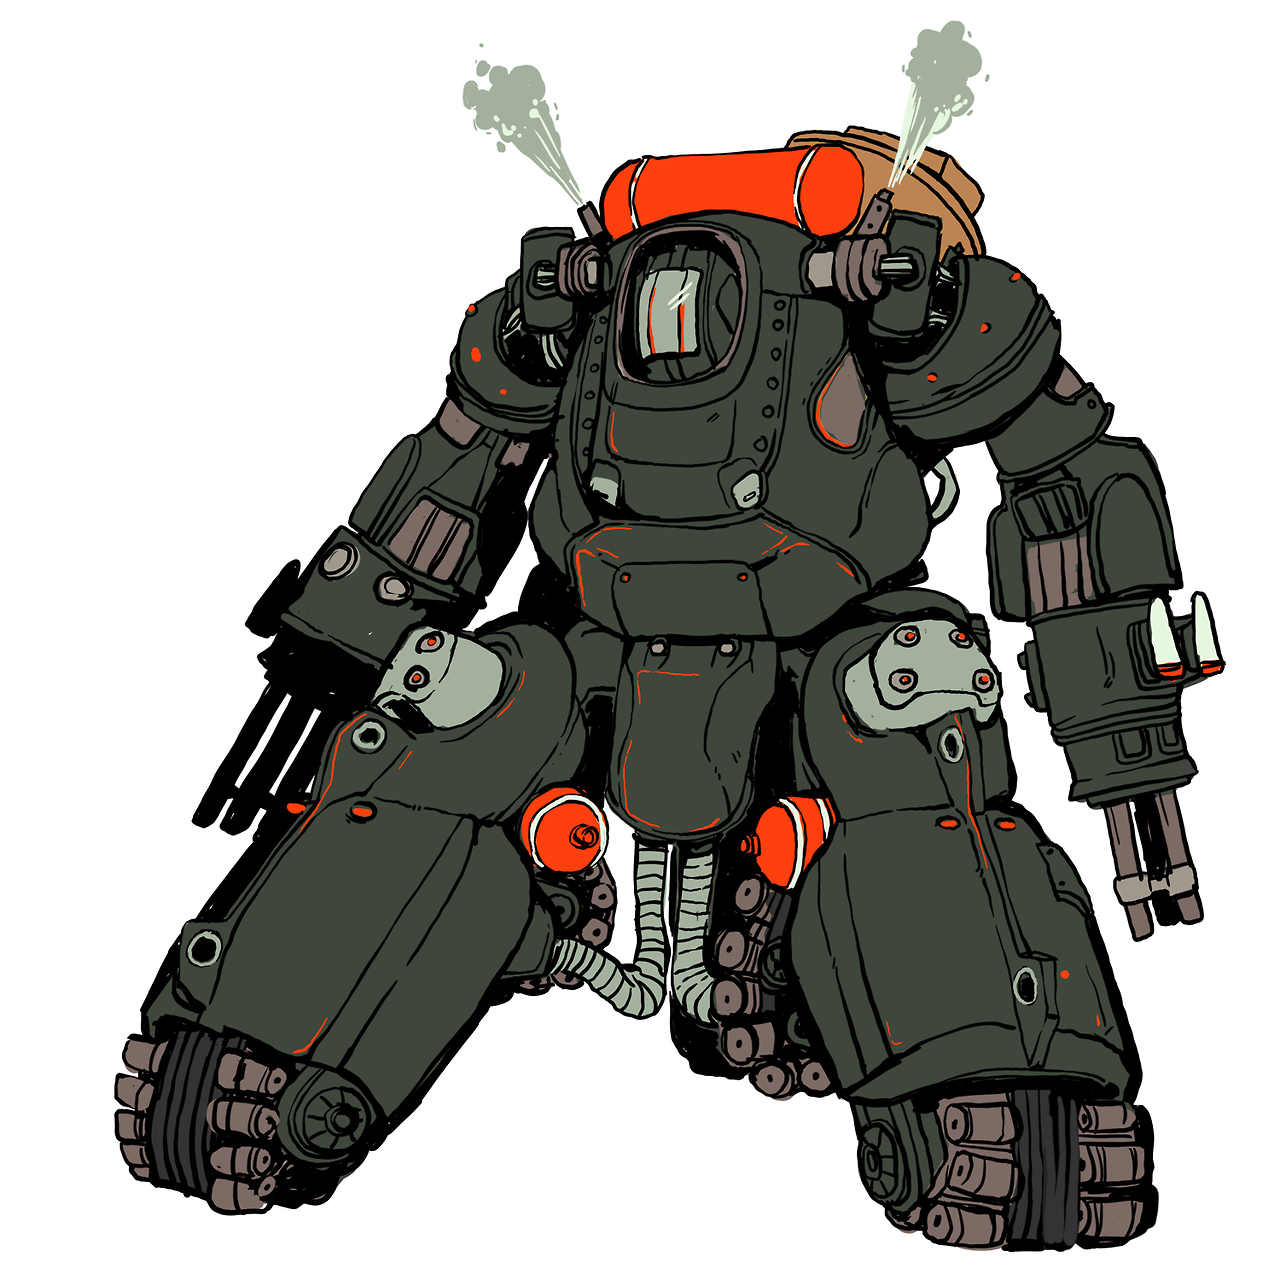 Robot Tumblr Fallout Art Fallout Concept Art Robot